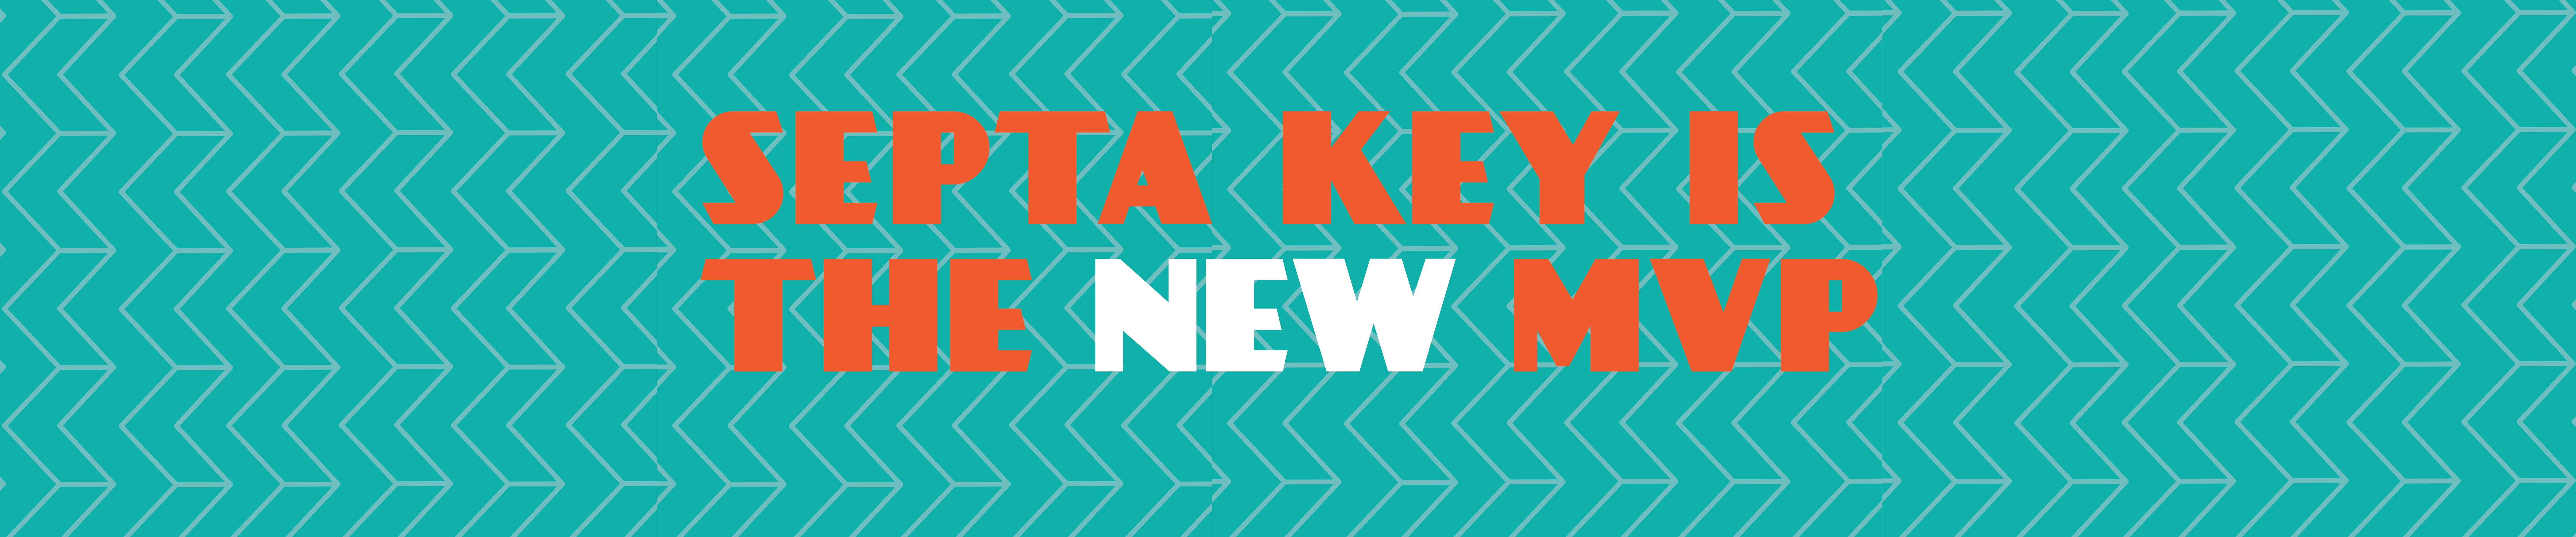 Key header 2592x540 06.04.18 01